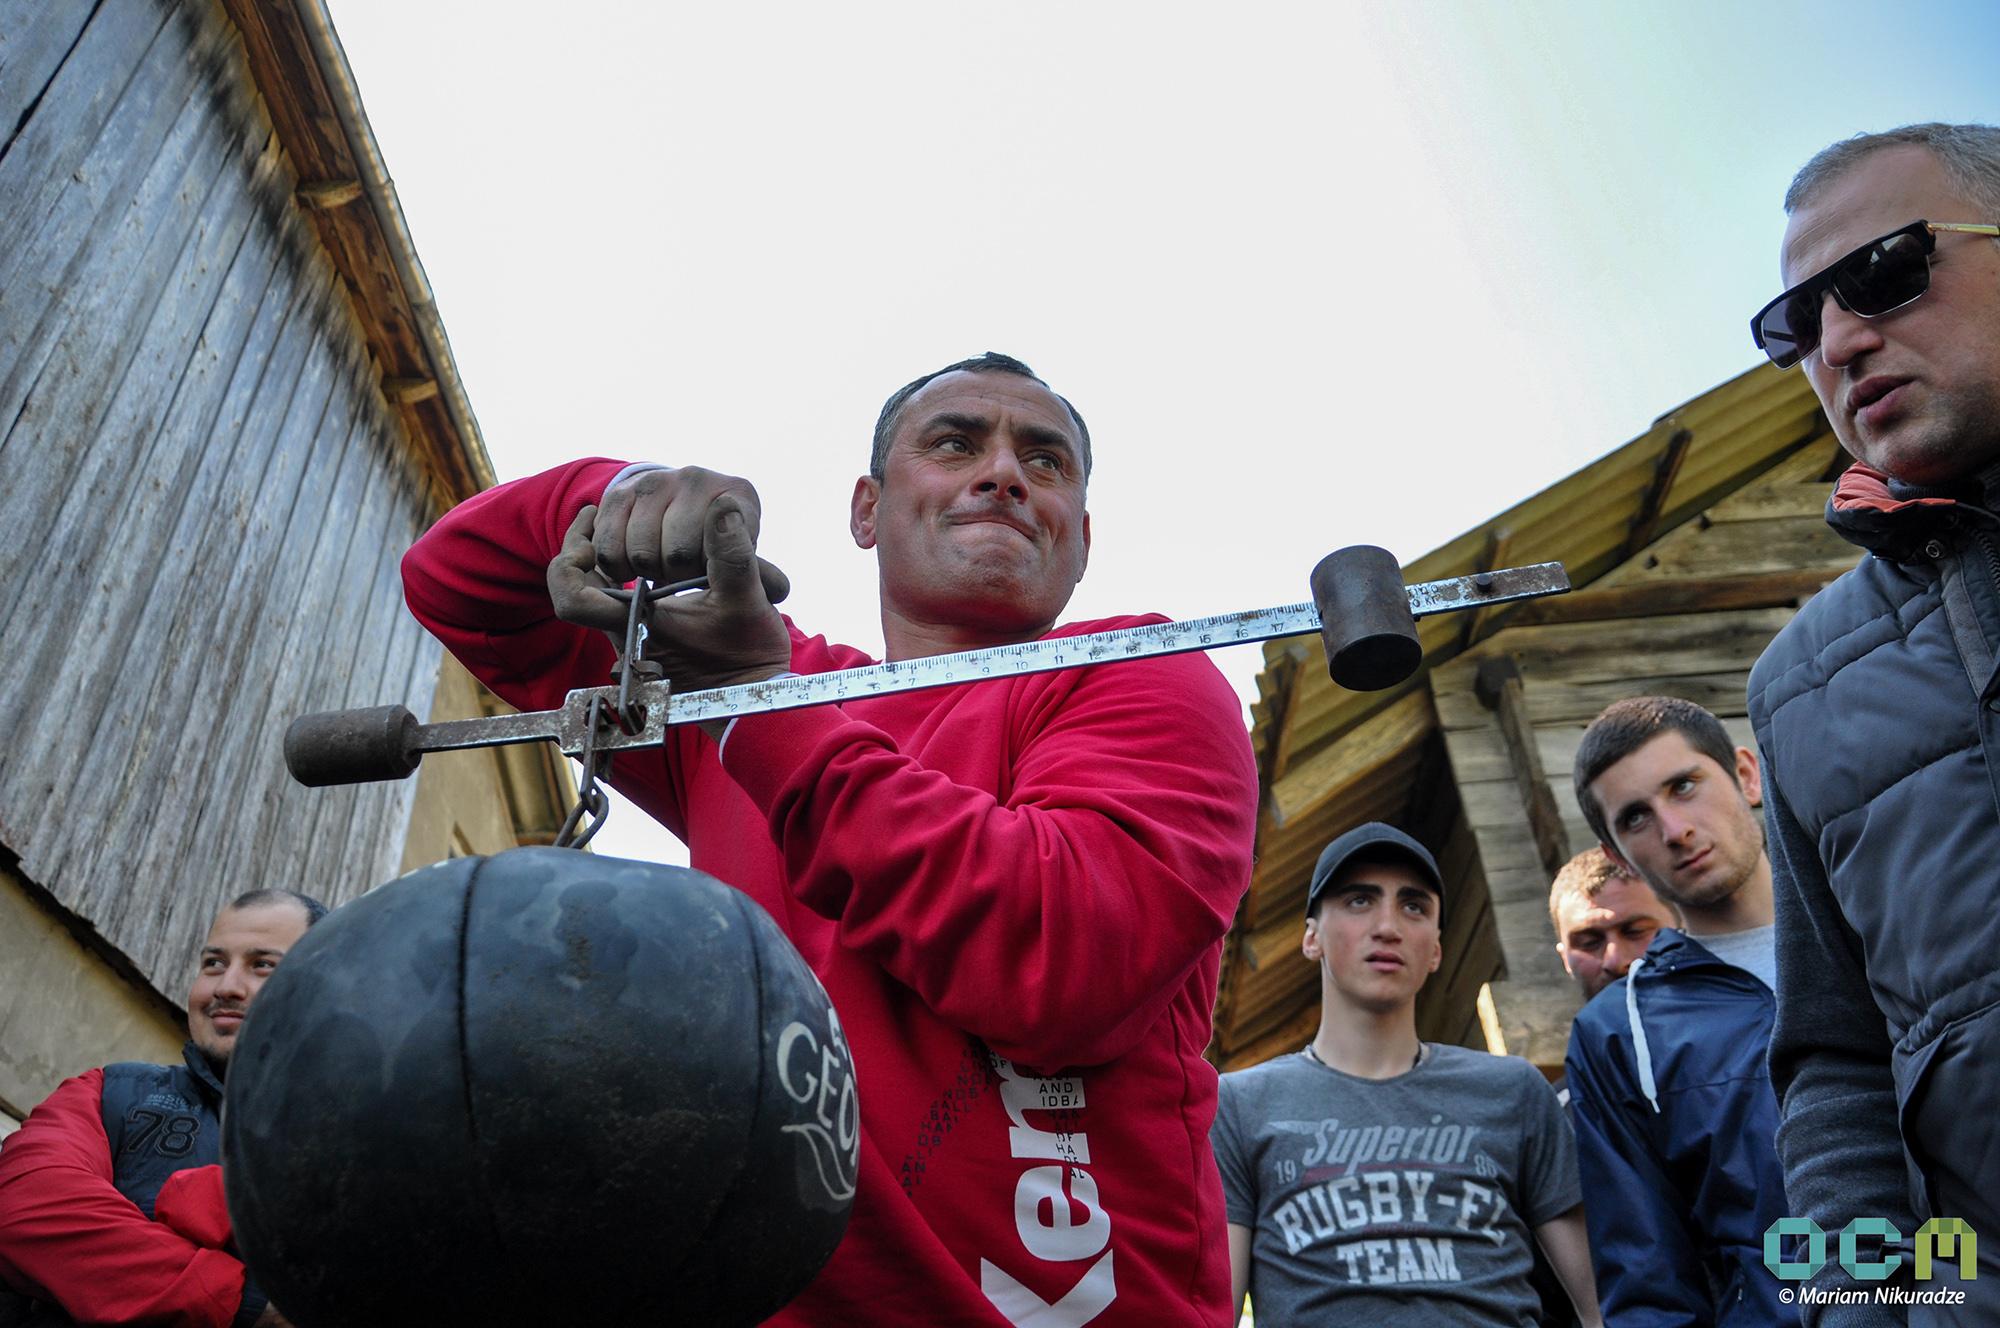 This year the ball weighed 18.1kg. Photo: Mariam Nikuradze/OC Media